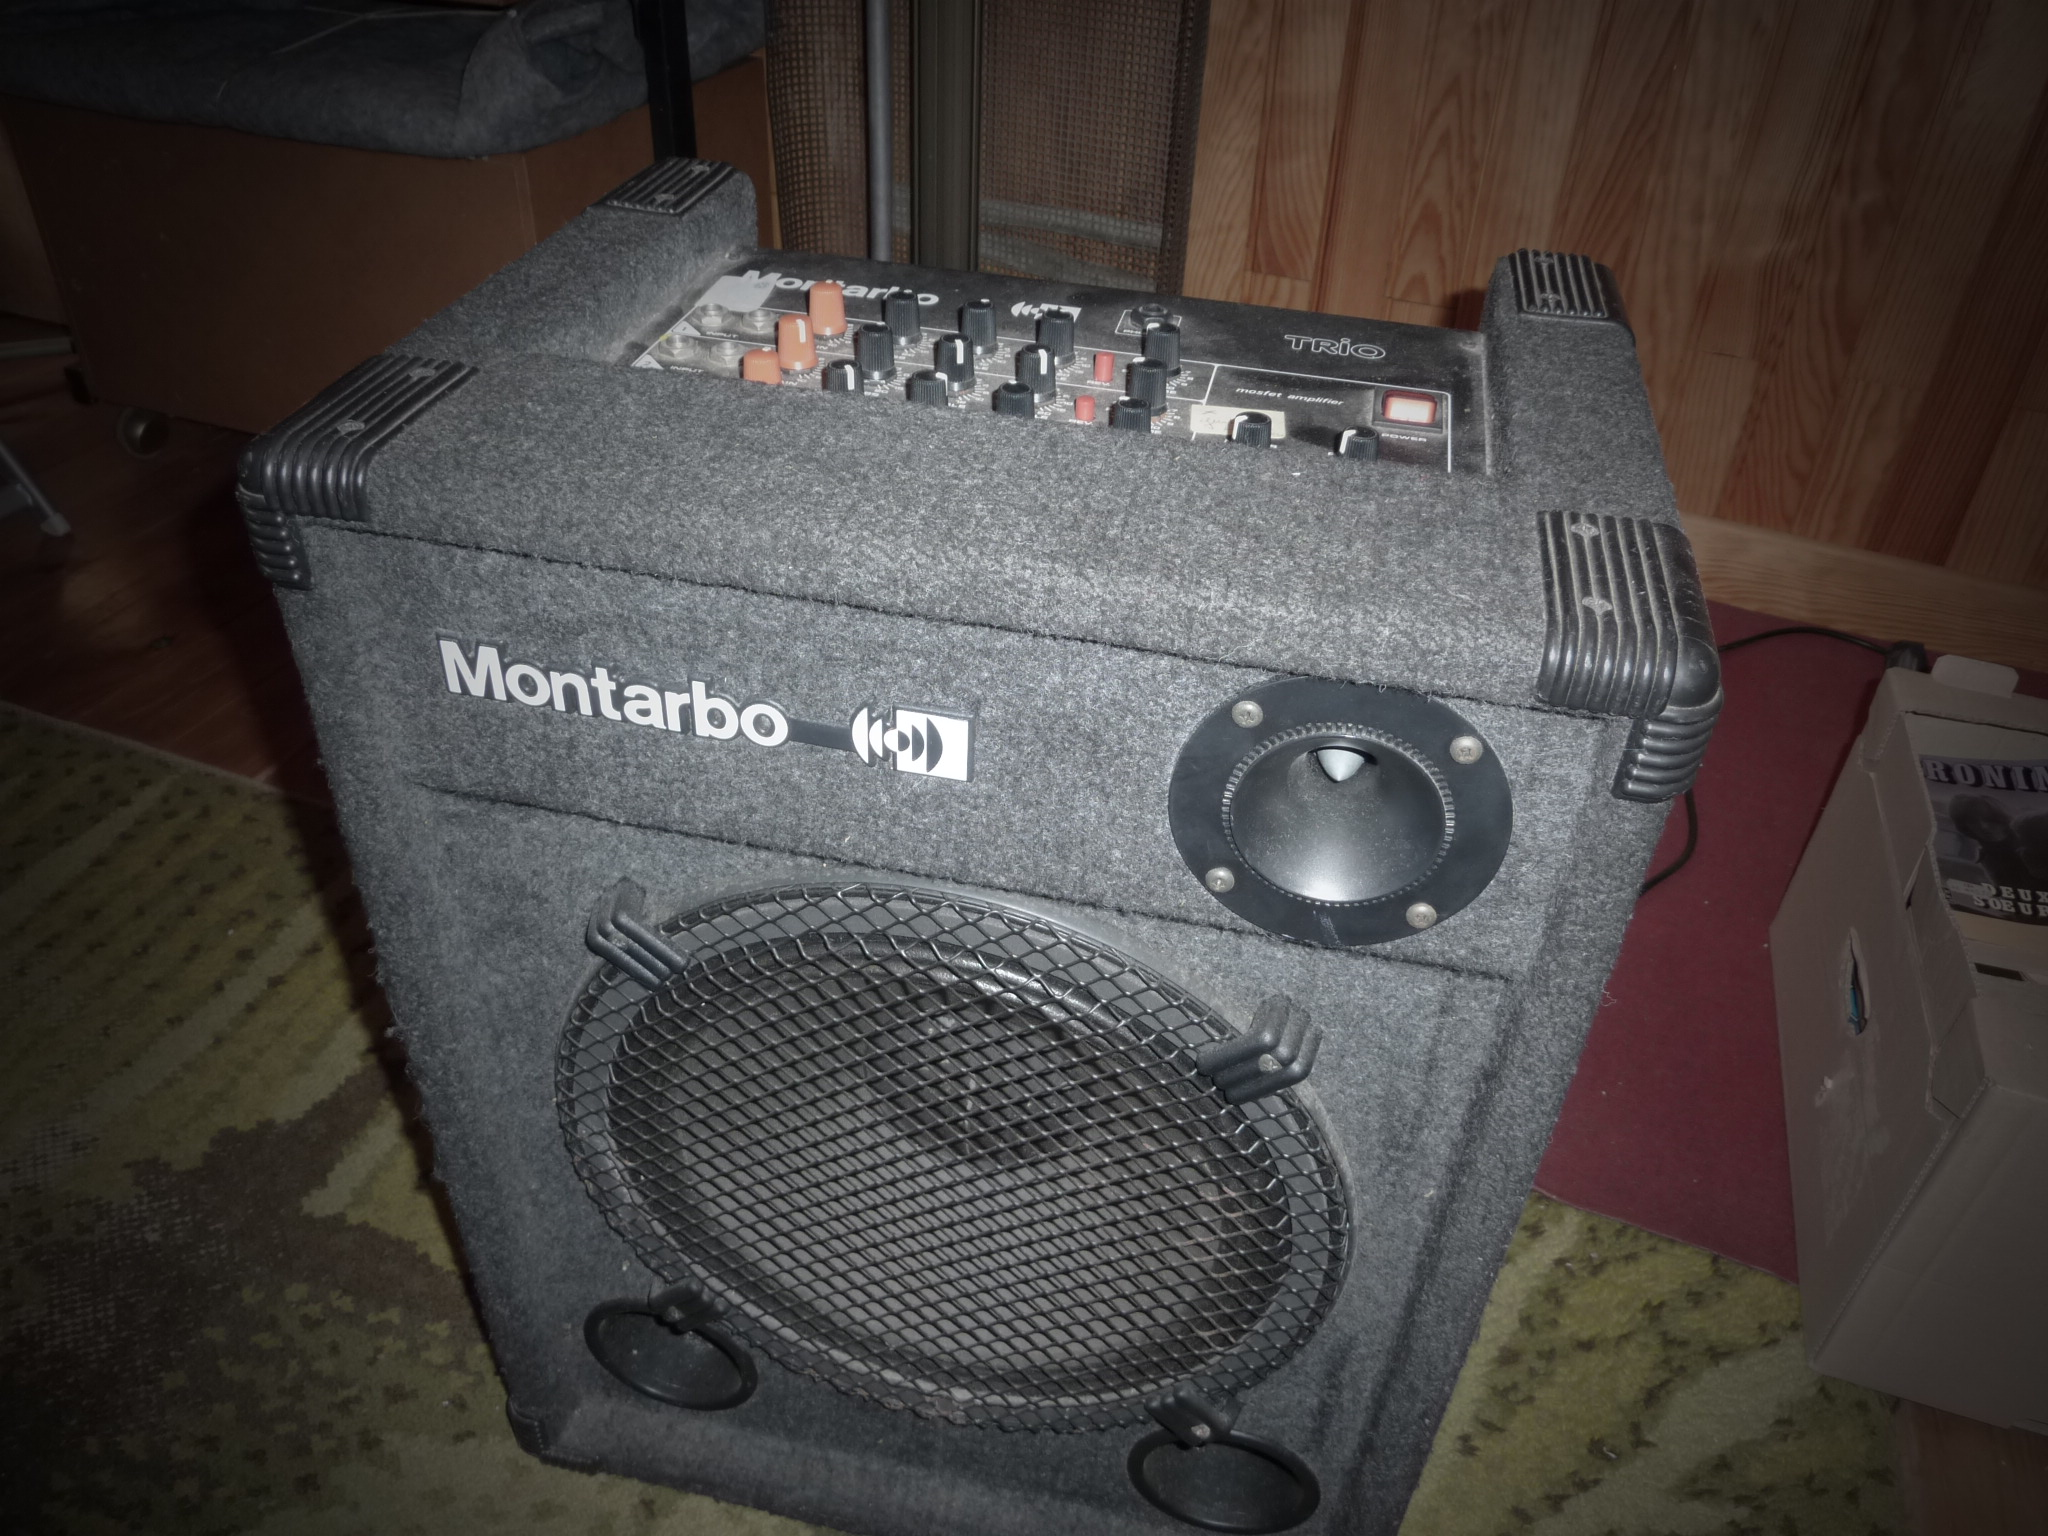 Revox1's review - Montarbo TRIO mosfet amplifier 75w - Audiofanzine